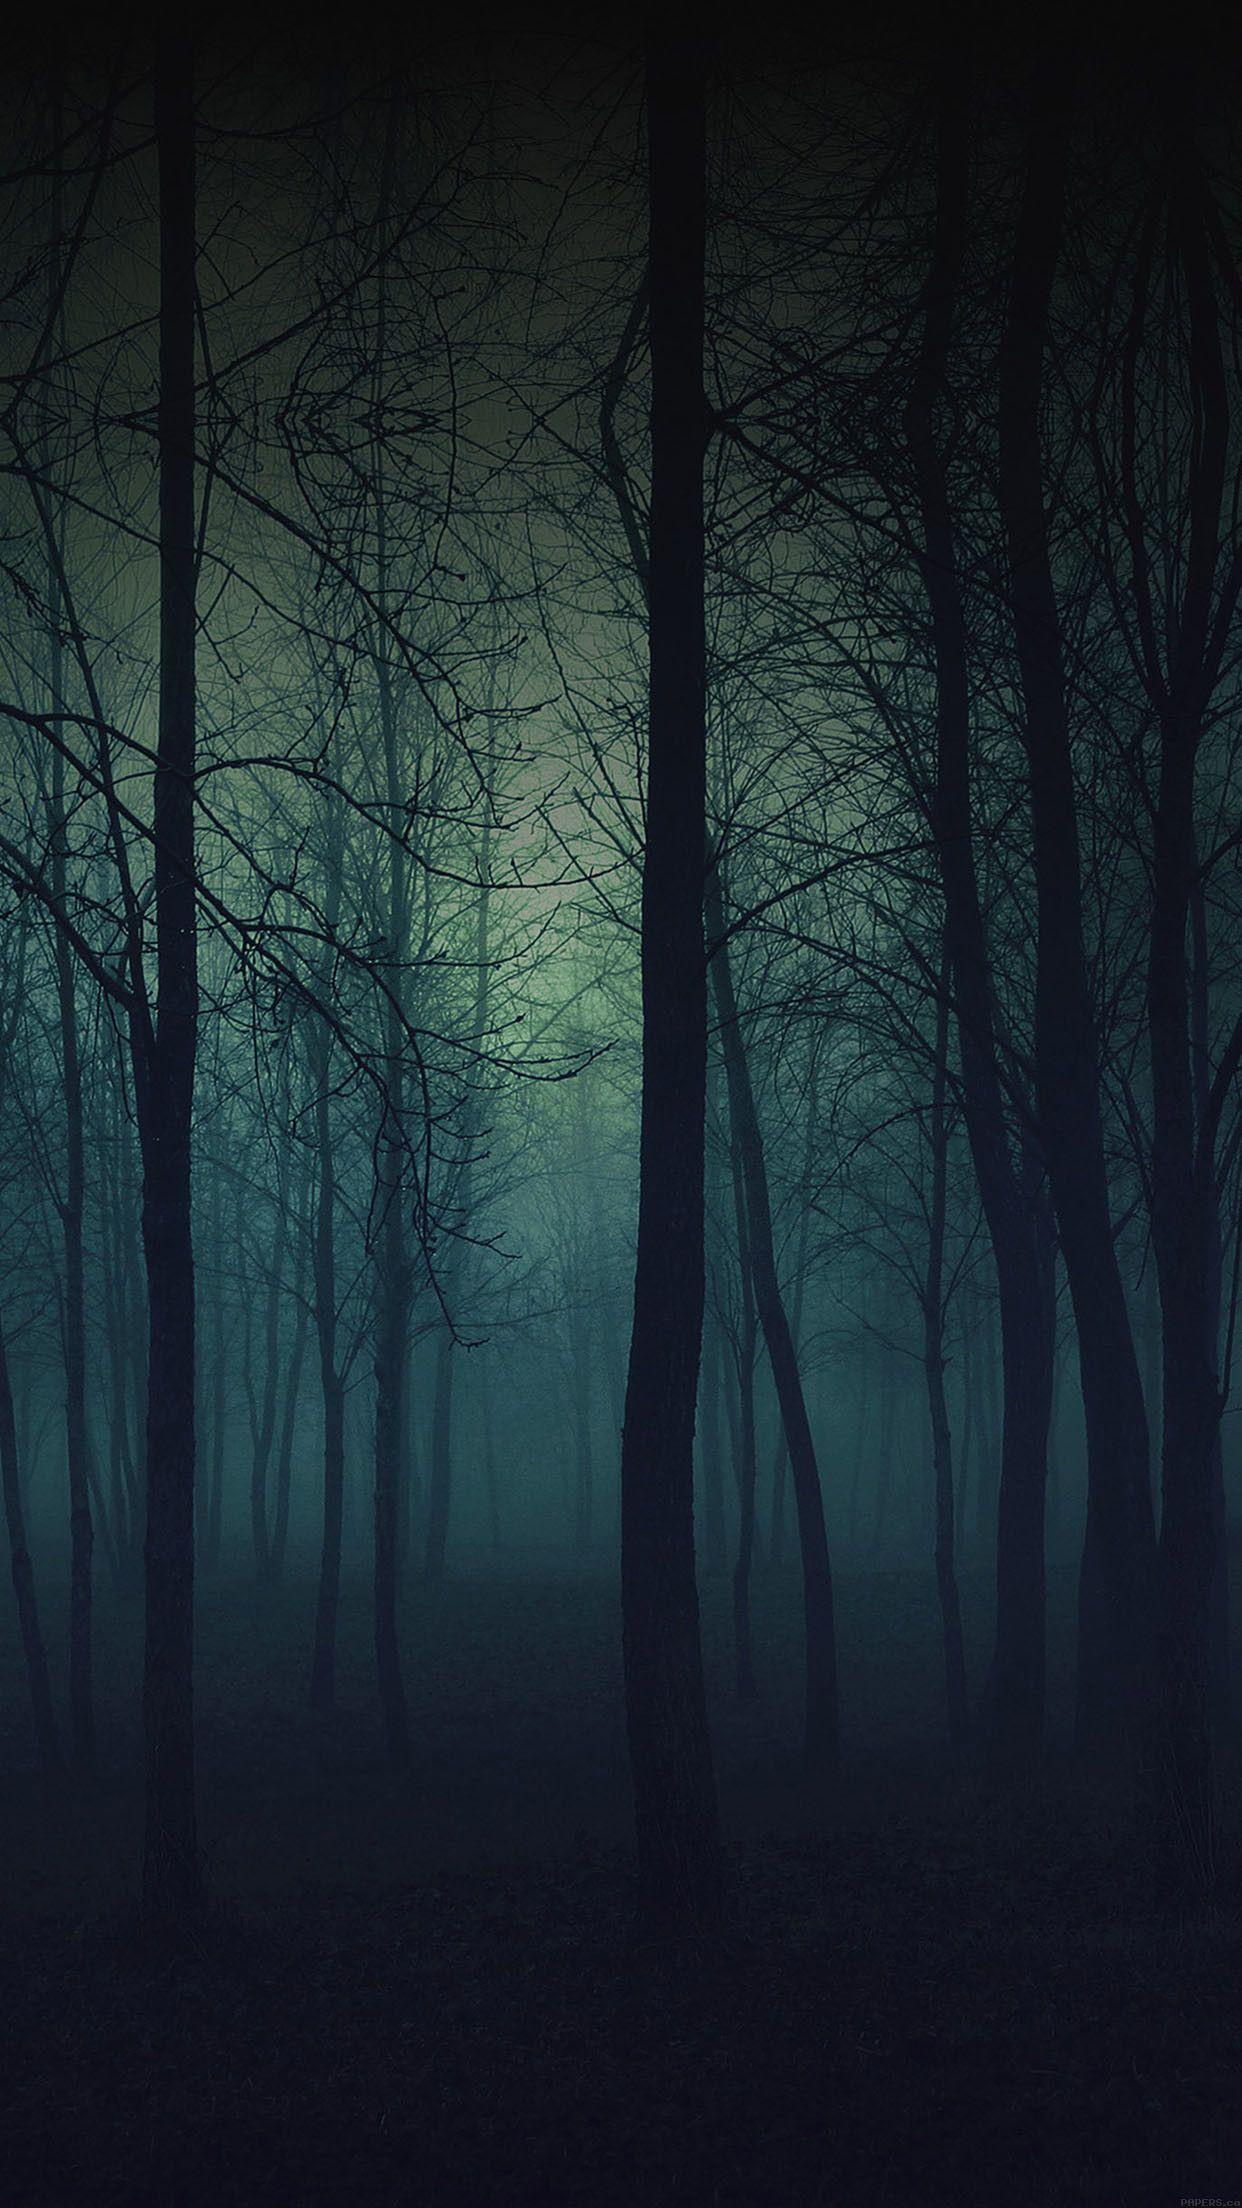 1242x2208 Natur Iphone 6 Tapete Iphone Hinter Tapete Hintergra Nde Dunkel Telefon Tapeten Dunklen Wald Dunkle Tapete Hintergrundbilder Natur Wald Tapete